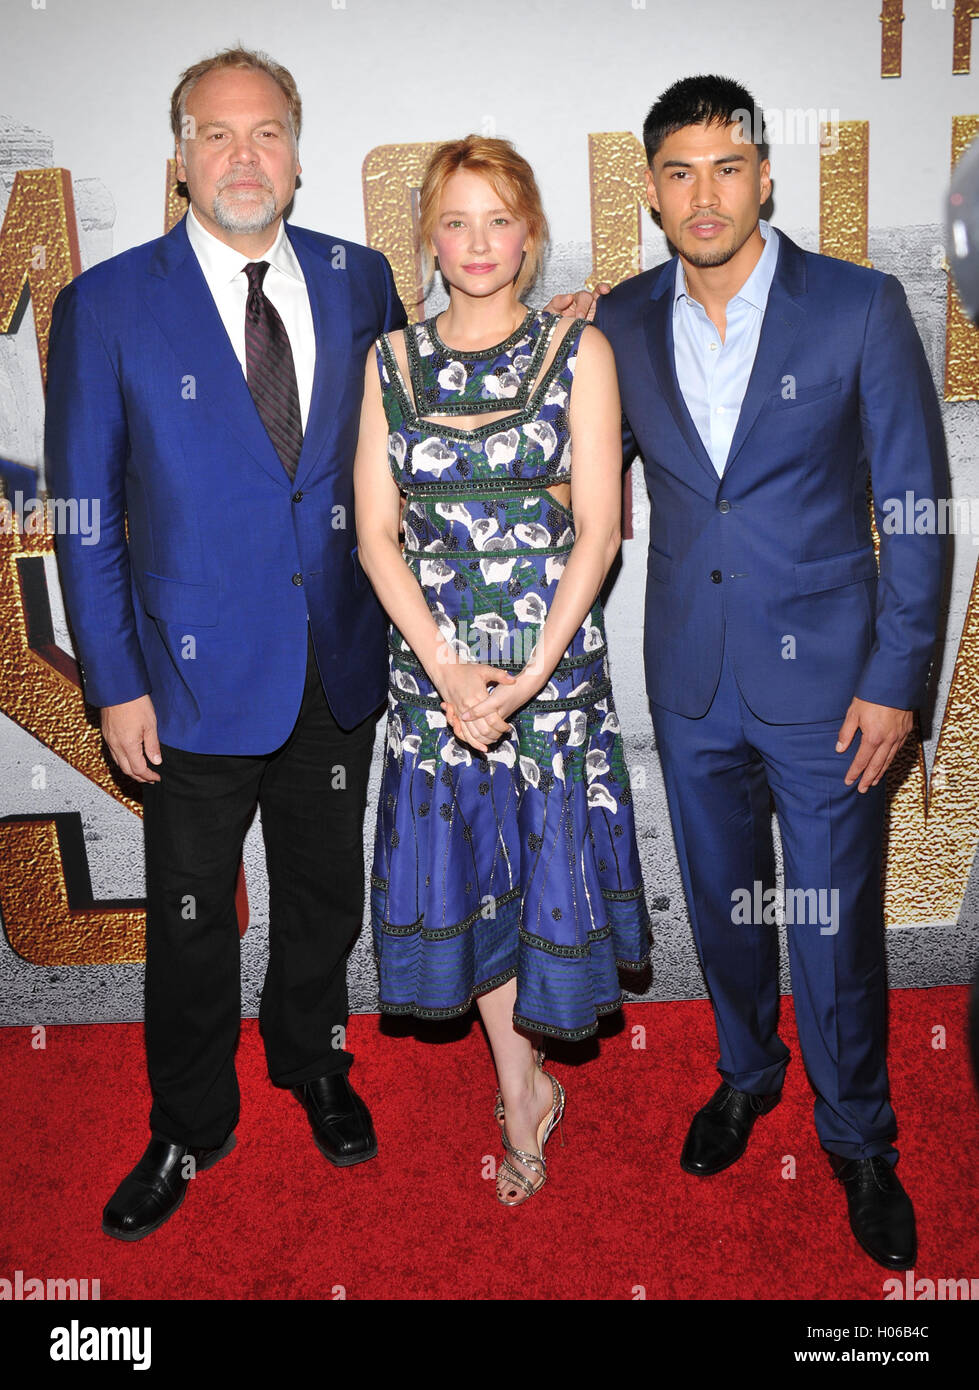 "New York, NY - 19 September: Vincent D'Onofrio, Haley Bennett und Martin Sensmeier besucht die ""The Magnificent Stockfoto"